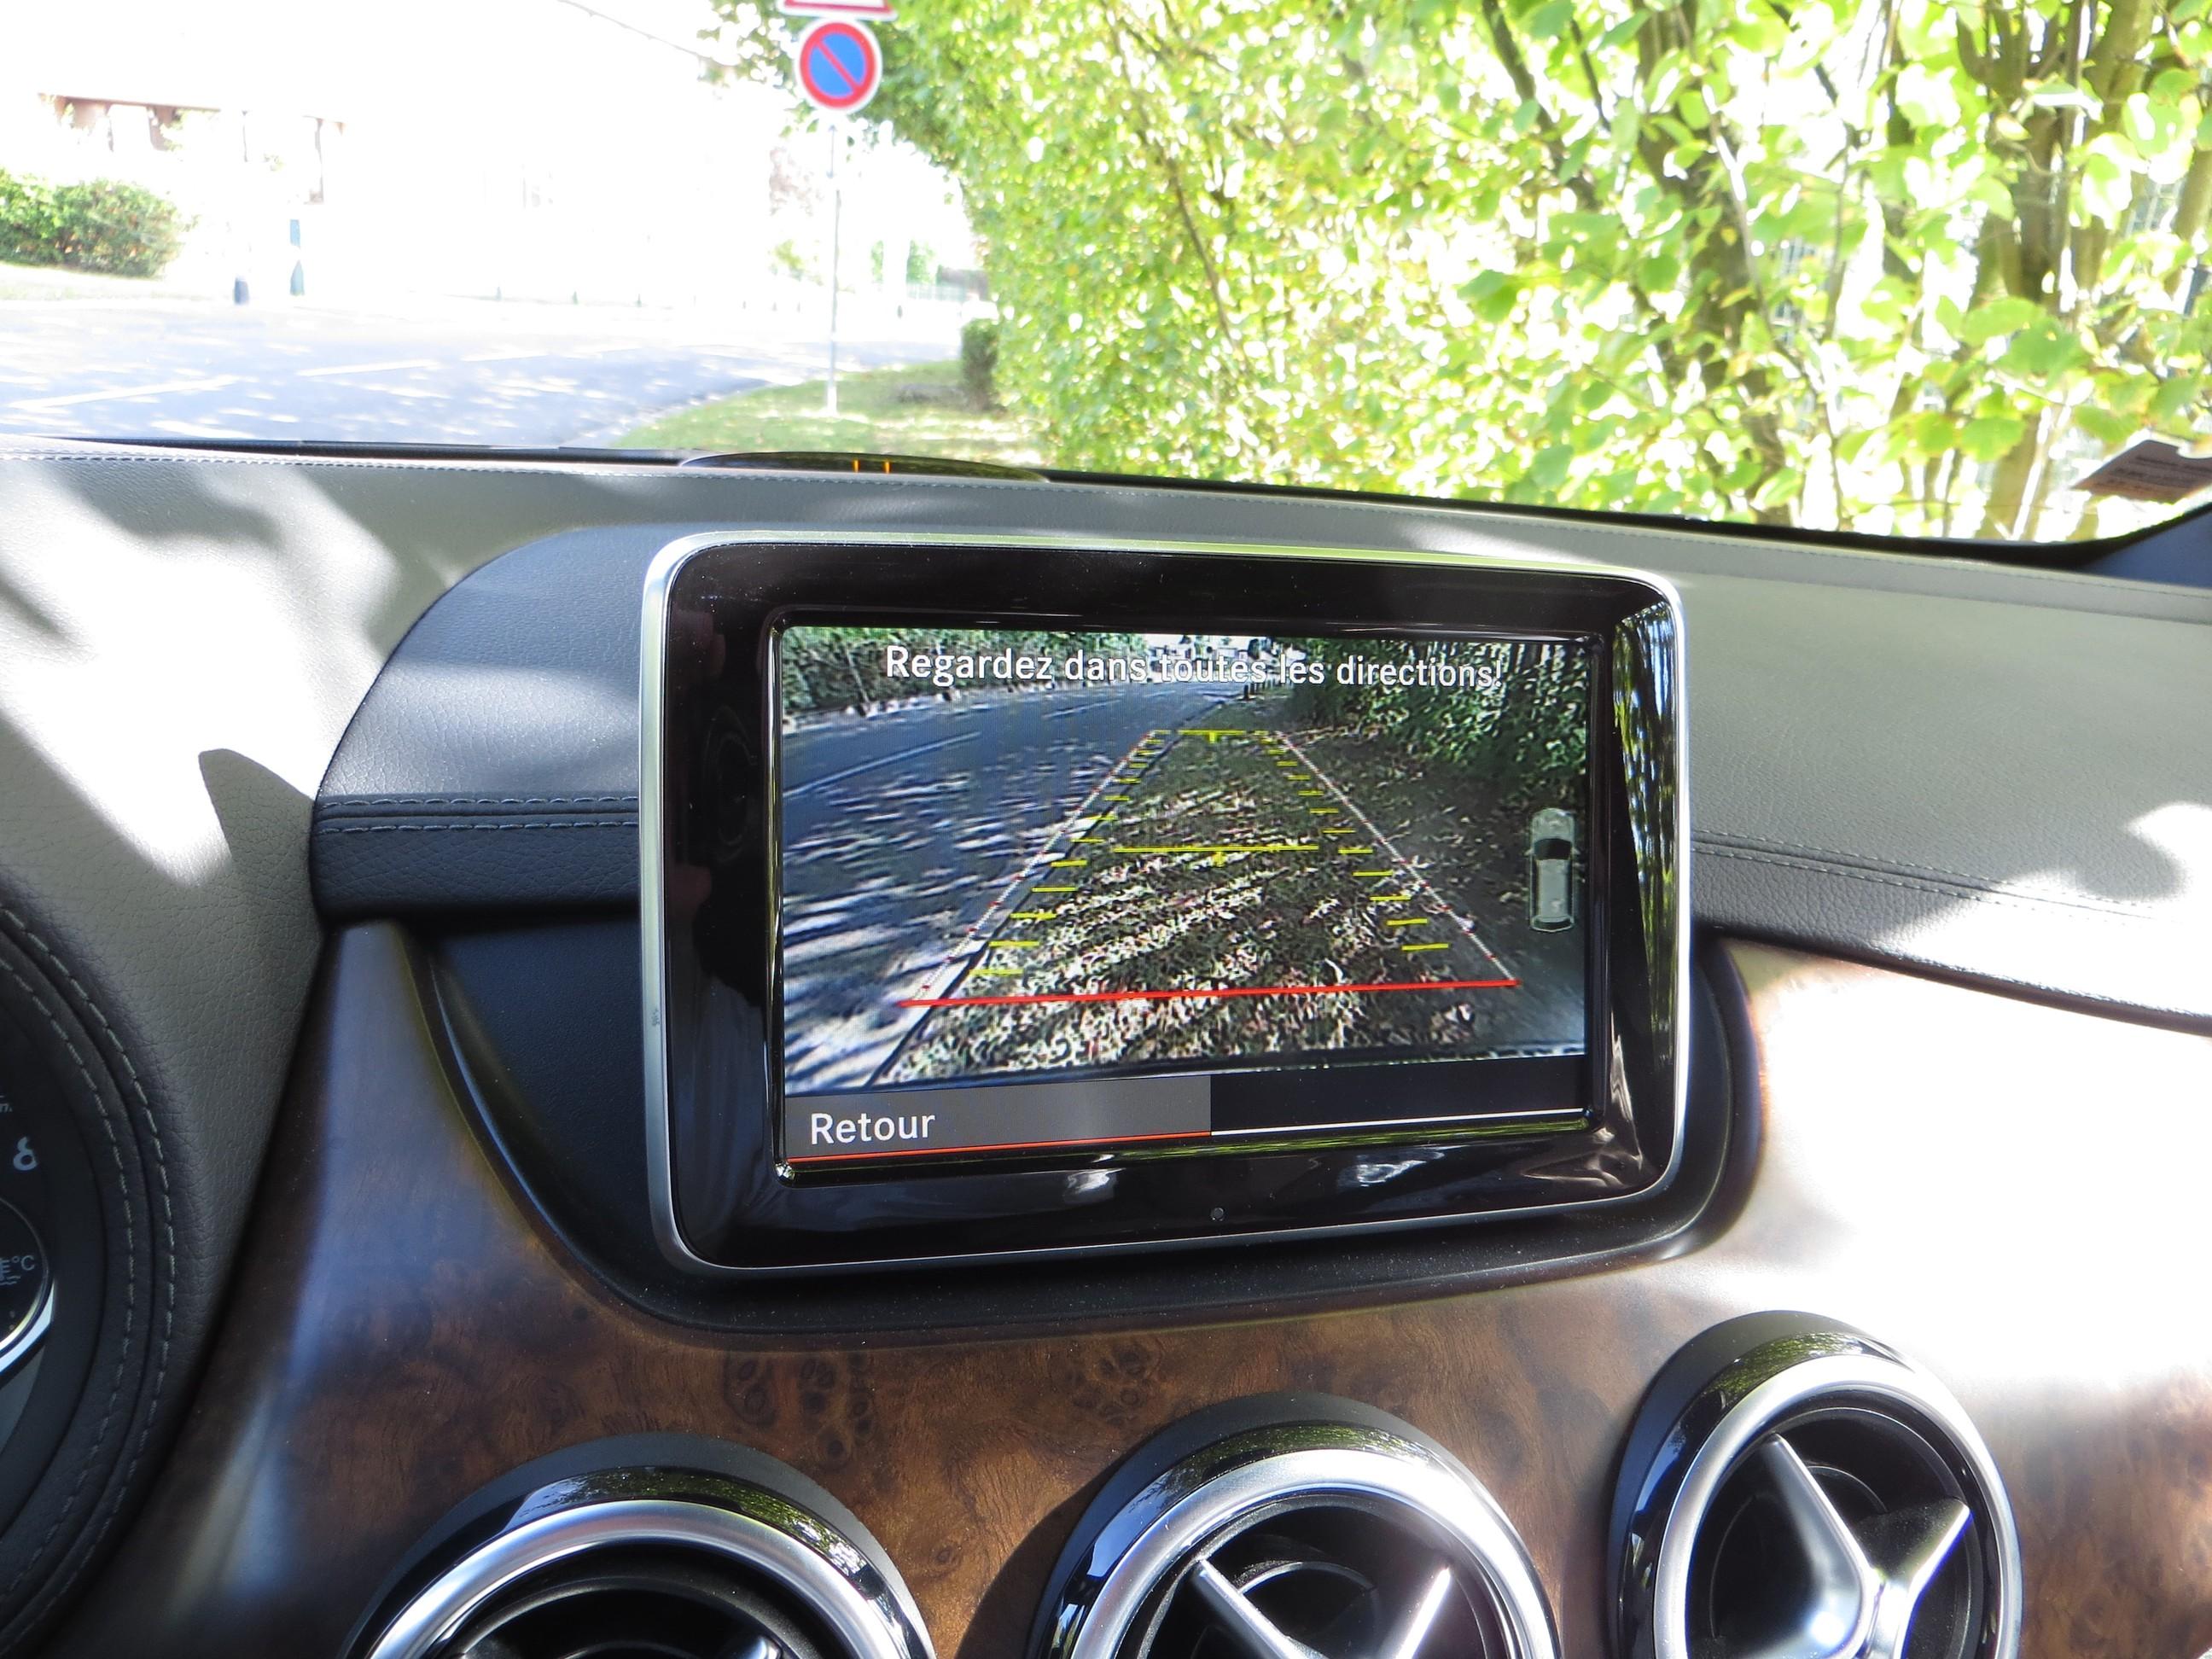 Test Drive Rpt Mercedes Classe B 200 Fascination 1 6t